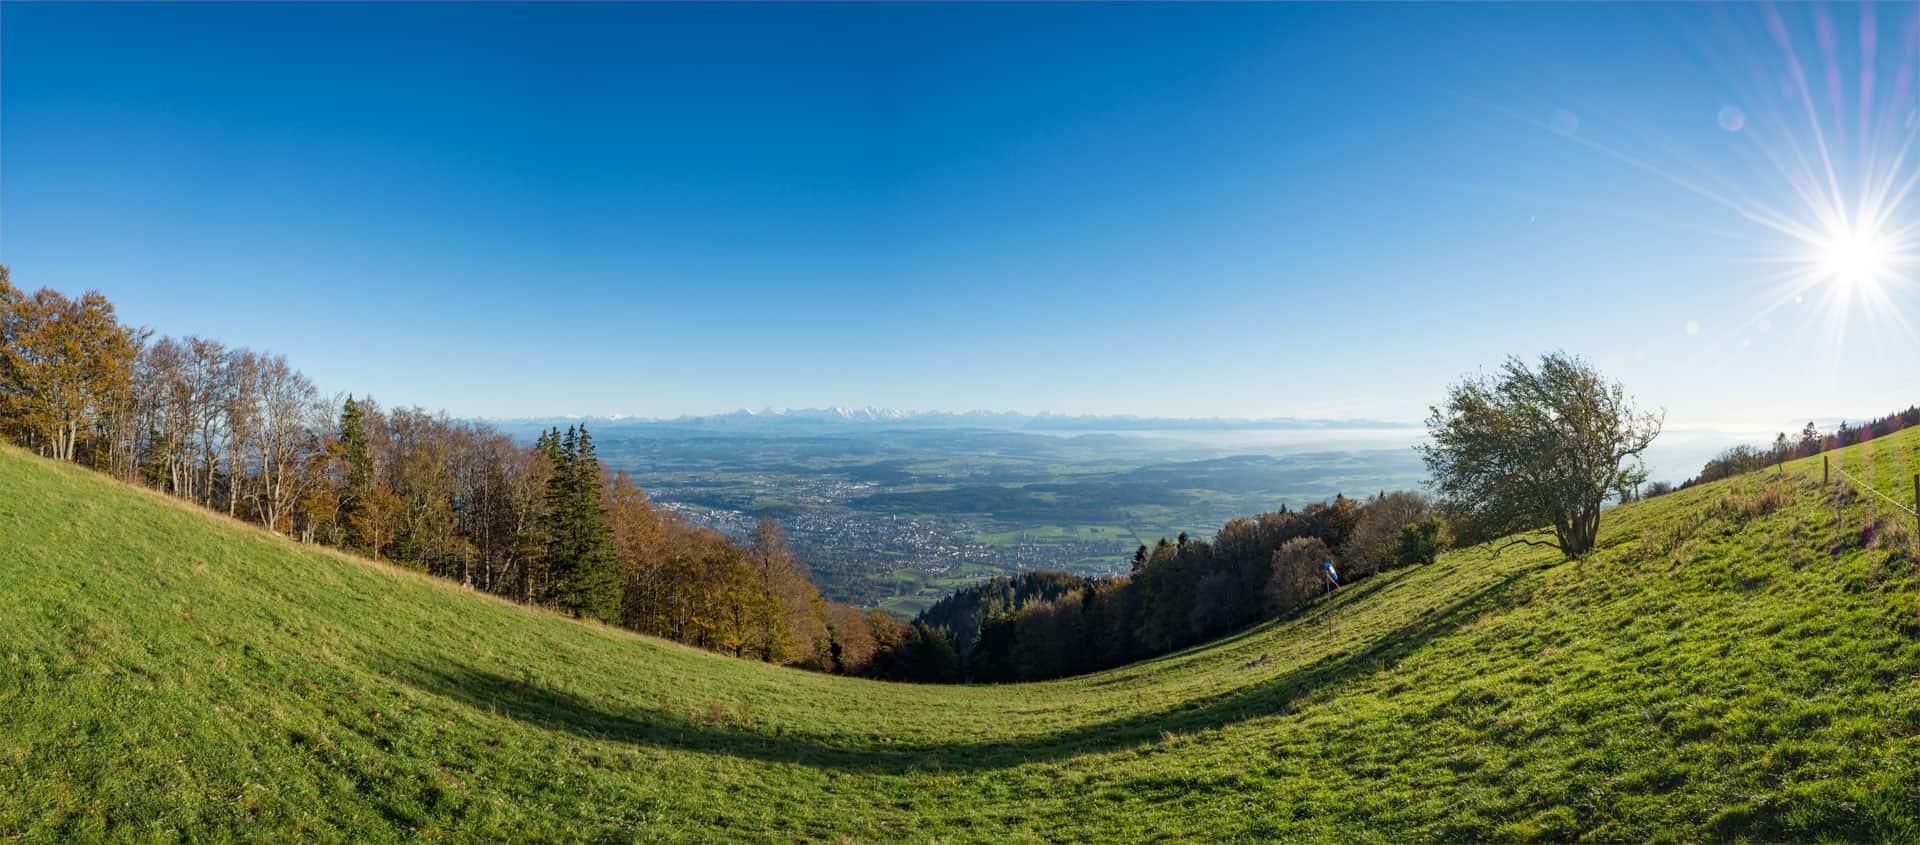 Starte auch du am Solothurner Hausberg